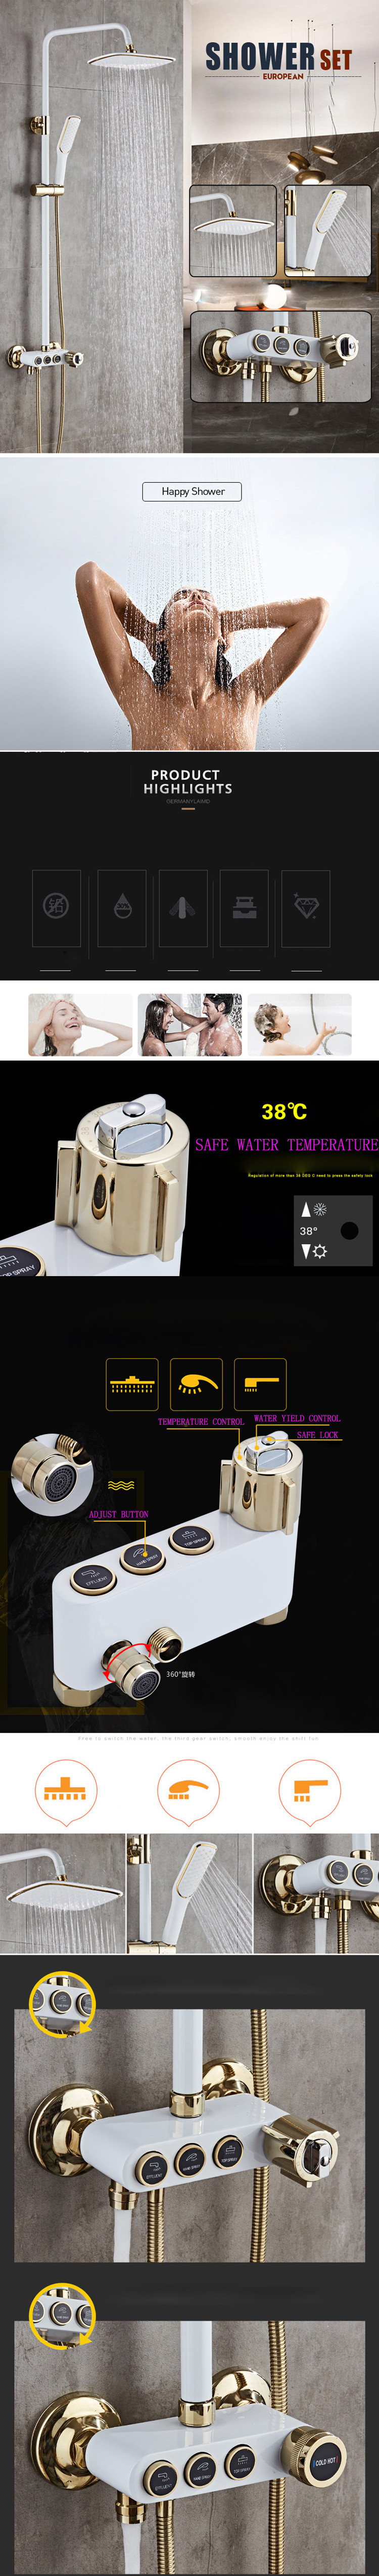 HTB1AE3pRhTpK1RjSZFKq6y2wXXaG Senducs Thermostatic Shower Set White Gold Bathroom Shower System Quality Brass Bathtub Faucet Newly Intelligent Gold Shower Set